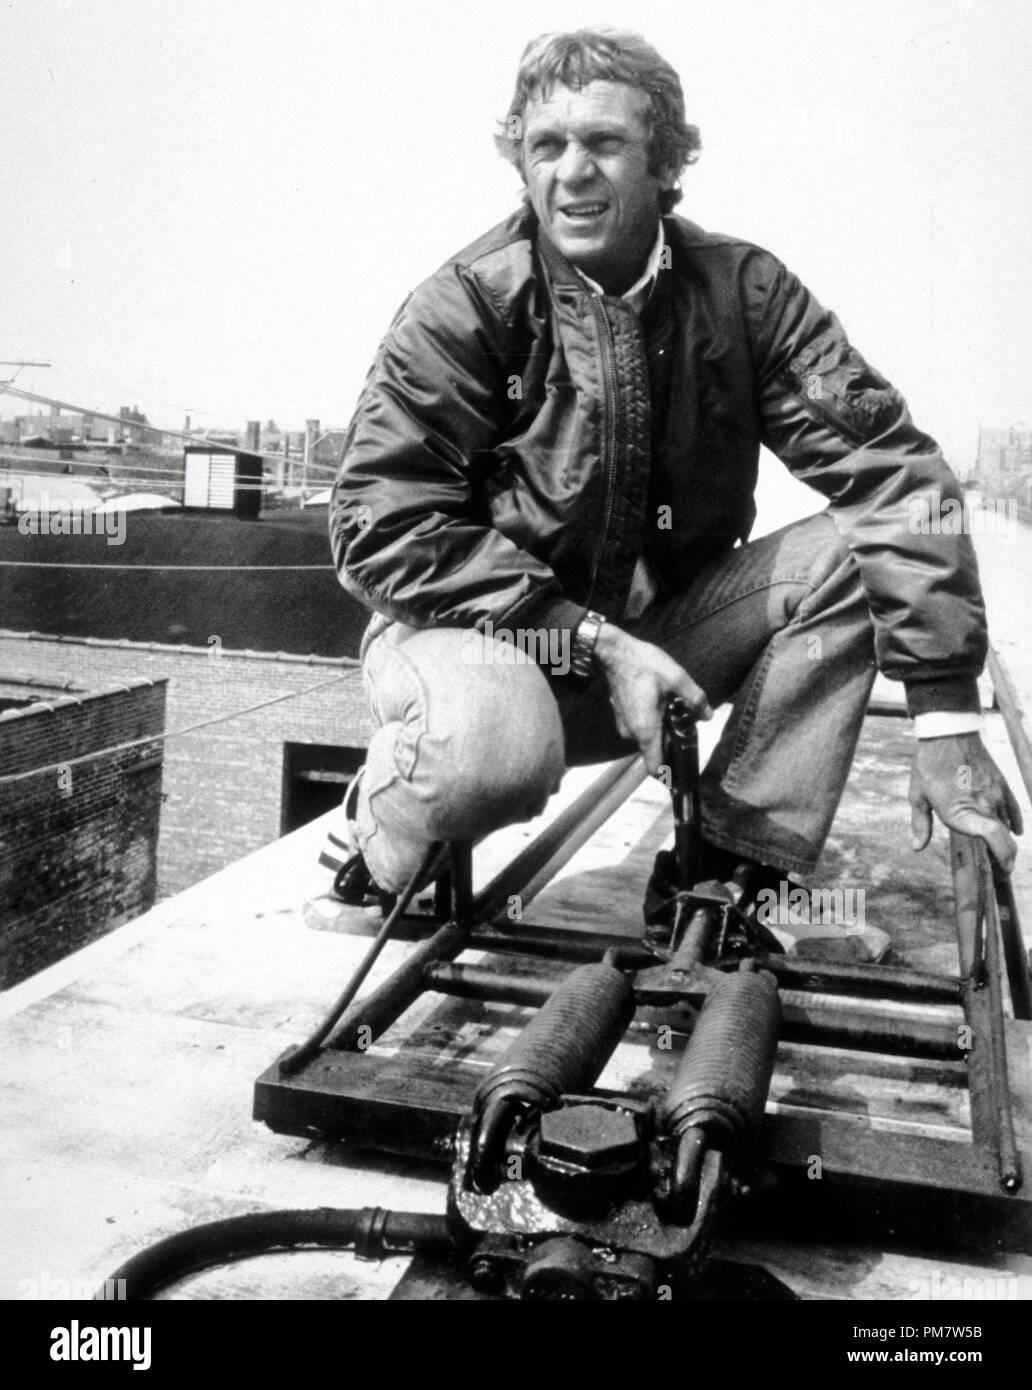 "(Archivierung klassische Kino - Steve McQueen Retrospektive) Steve McQueen ""Hunter"" Datei Referenz # 31386_898 THA Stockbild"